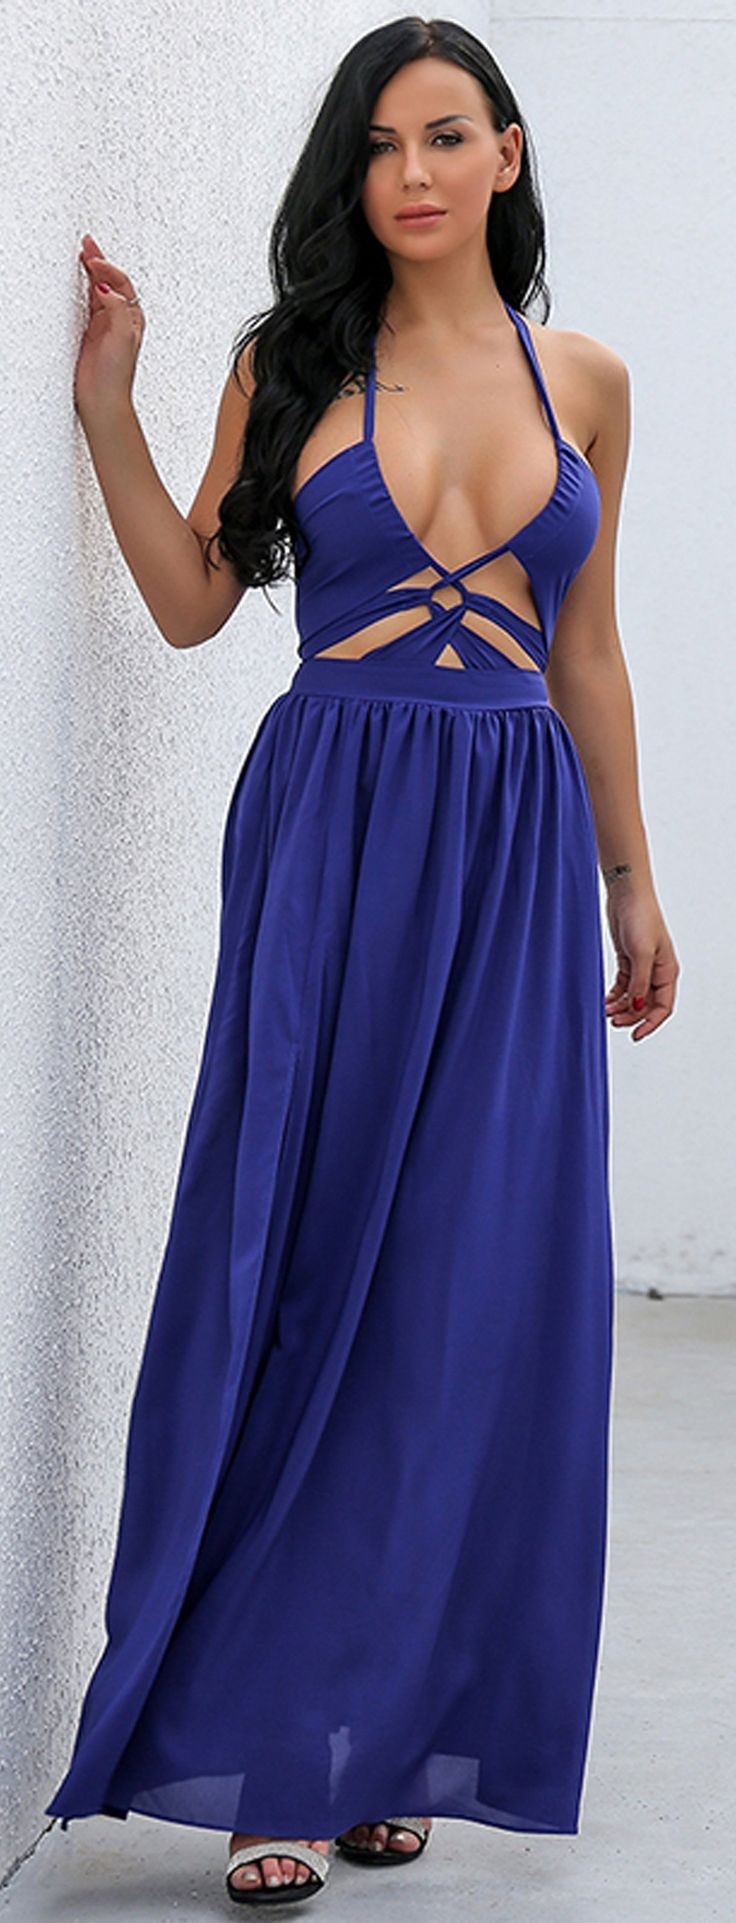 Increíble Vestidos De Boda únicos Pinterest Cresta - Vestido de ...